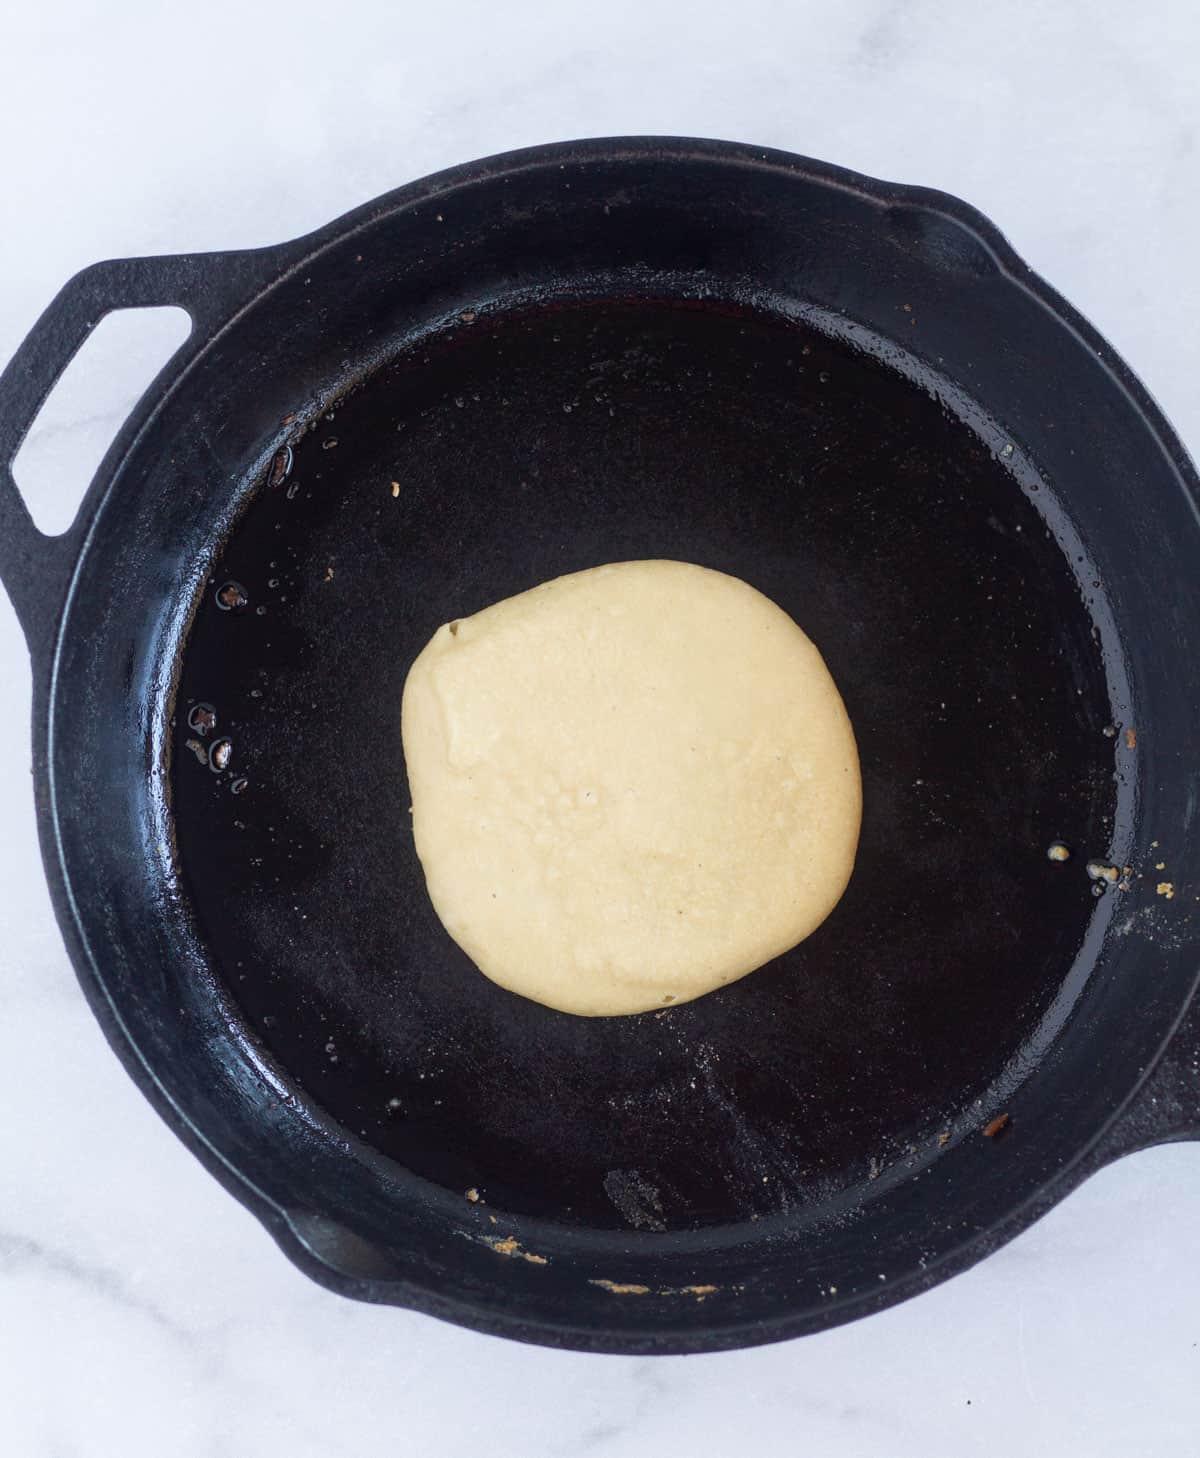 pancake cooking in cast iron skillet